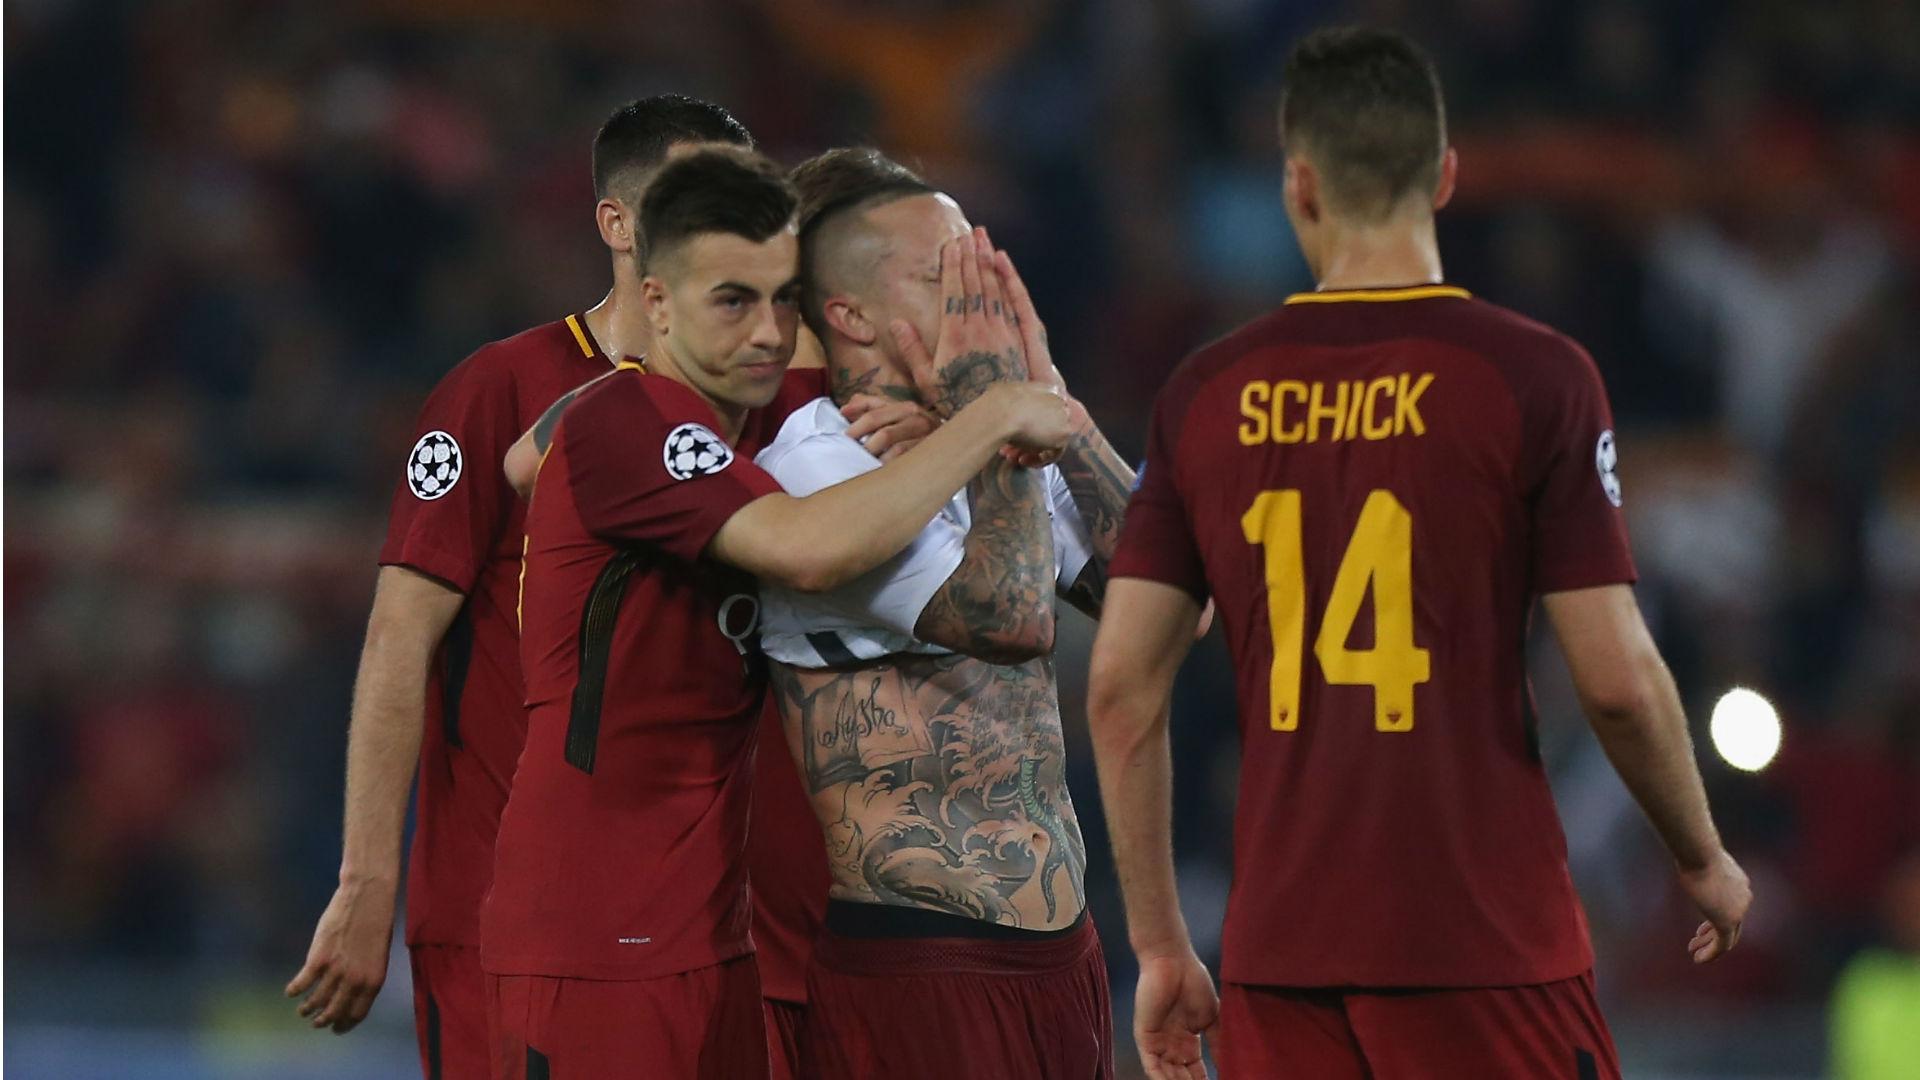 Roma thua thảm Liverpool 2-6 ở bán kết Champions League 2018